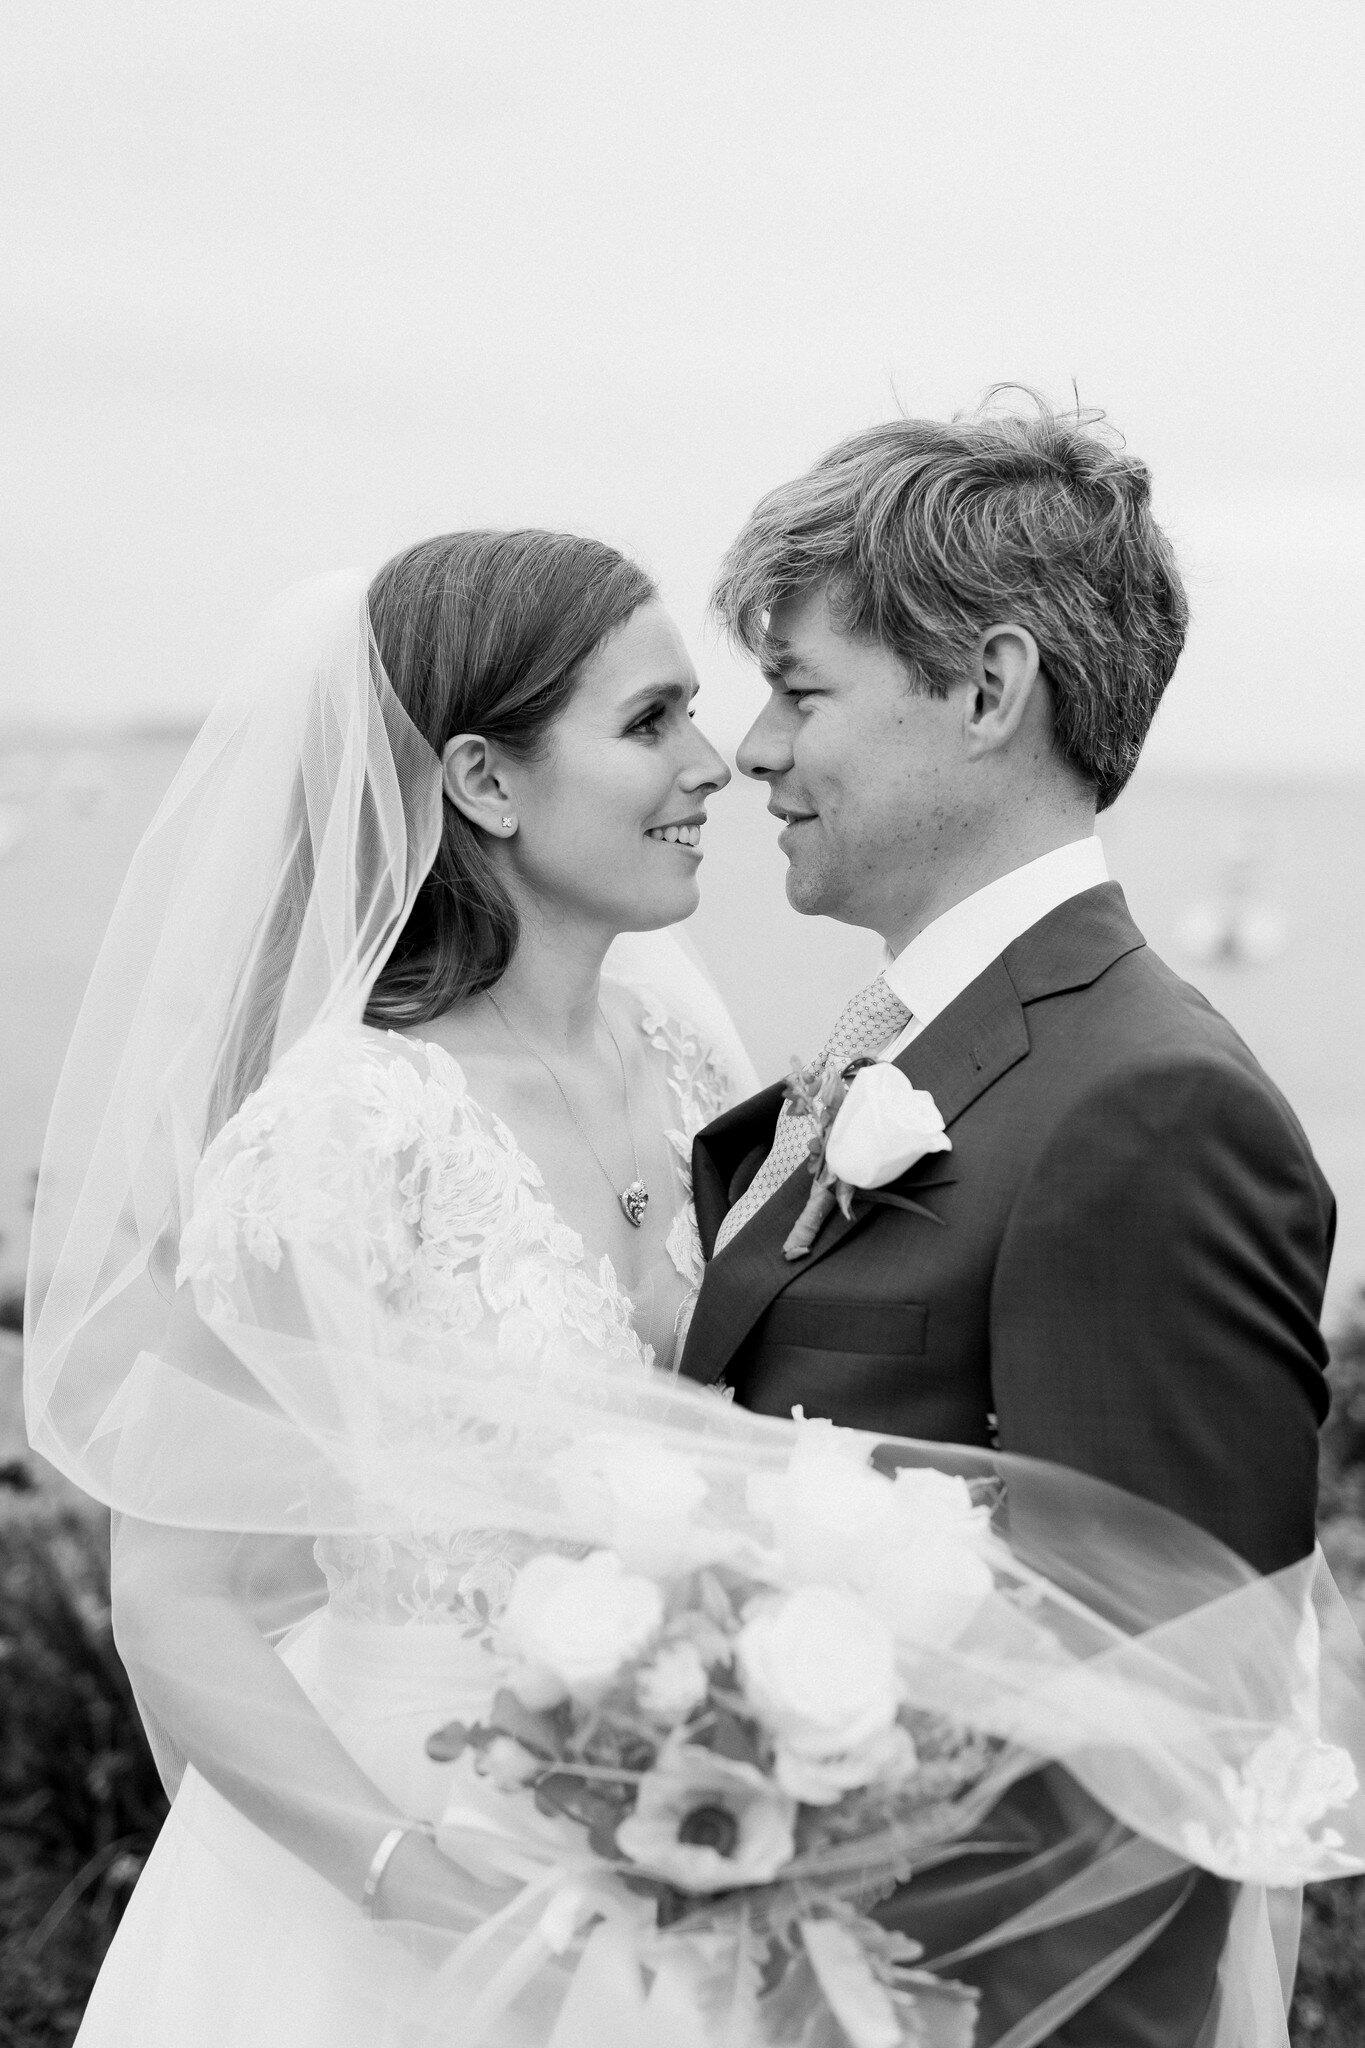 greenwich wedding_belle haven club wedding _ct wedding photographer-42_Easy-Resize.com.jpg